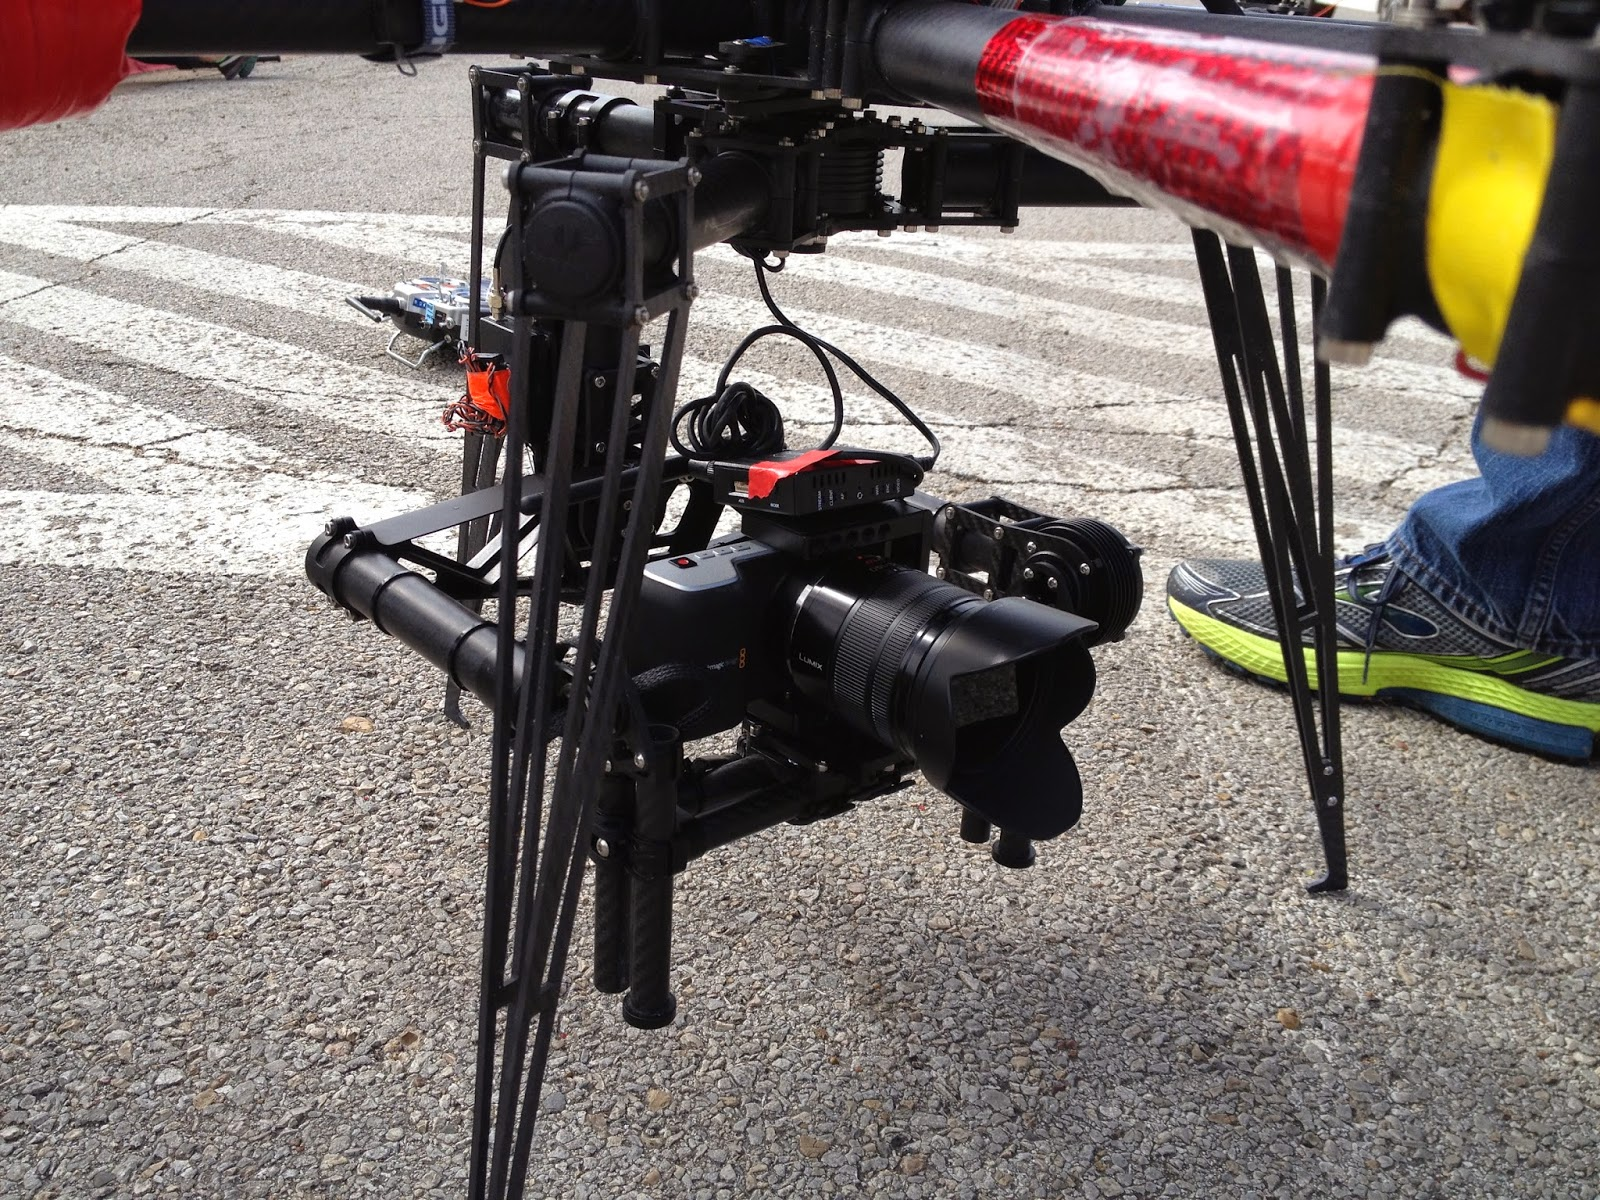 Behind The Looking Glass: Blackmagic Cinema Camera 2 5K on